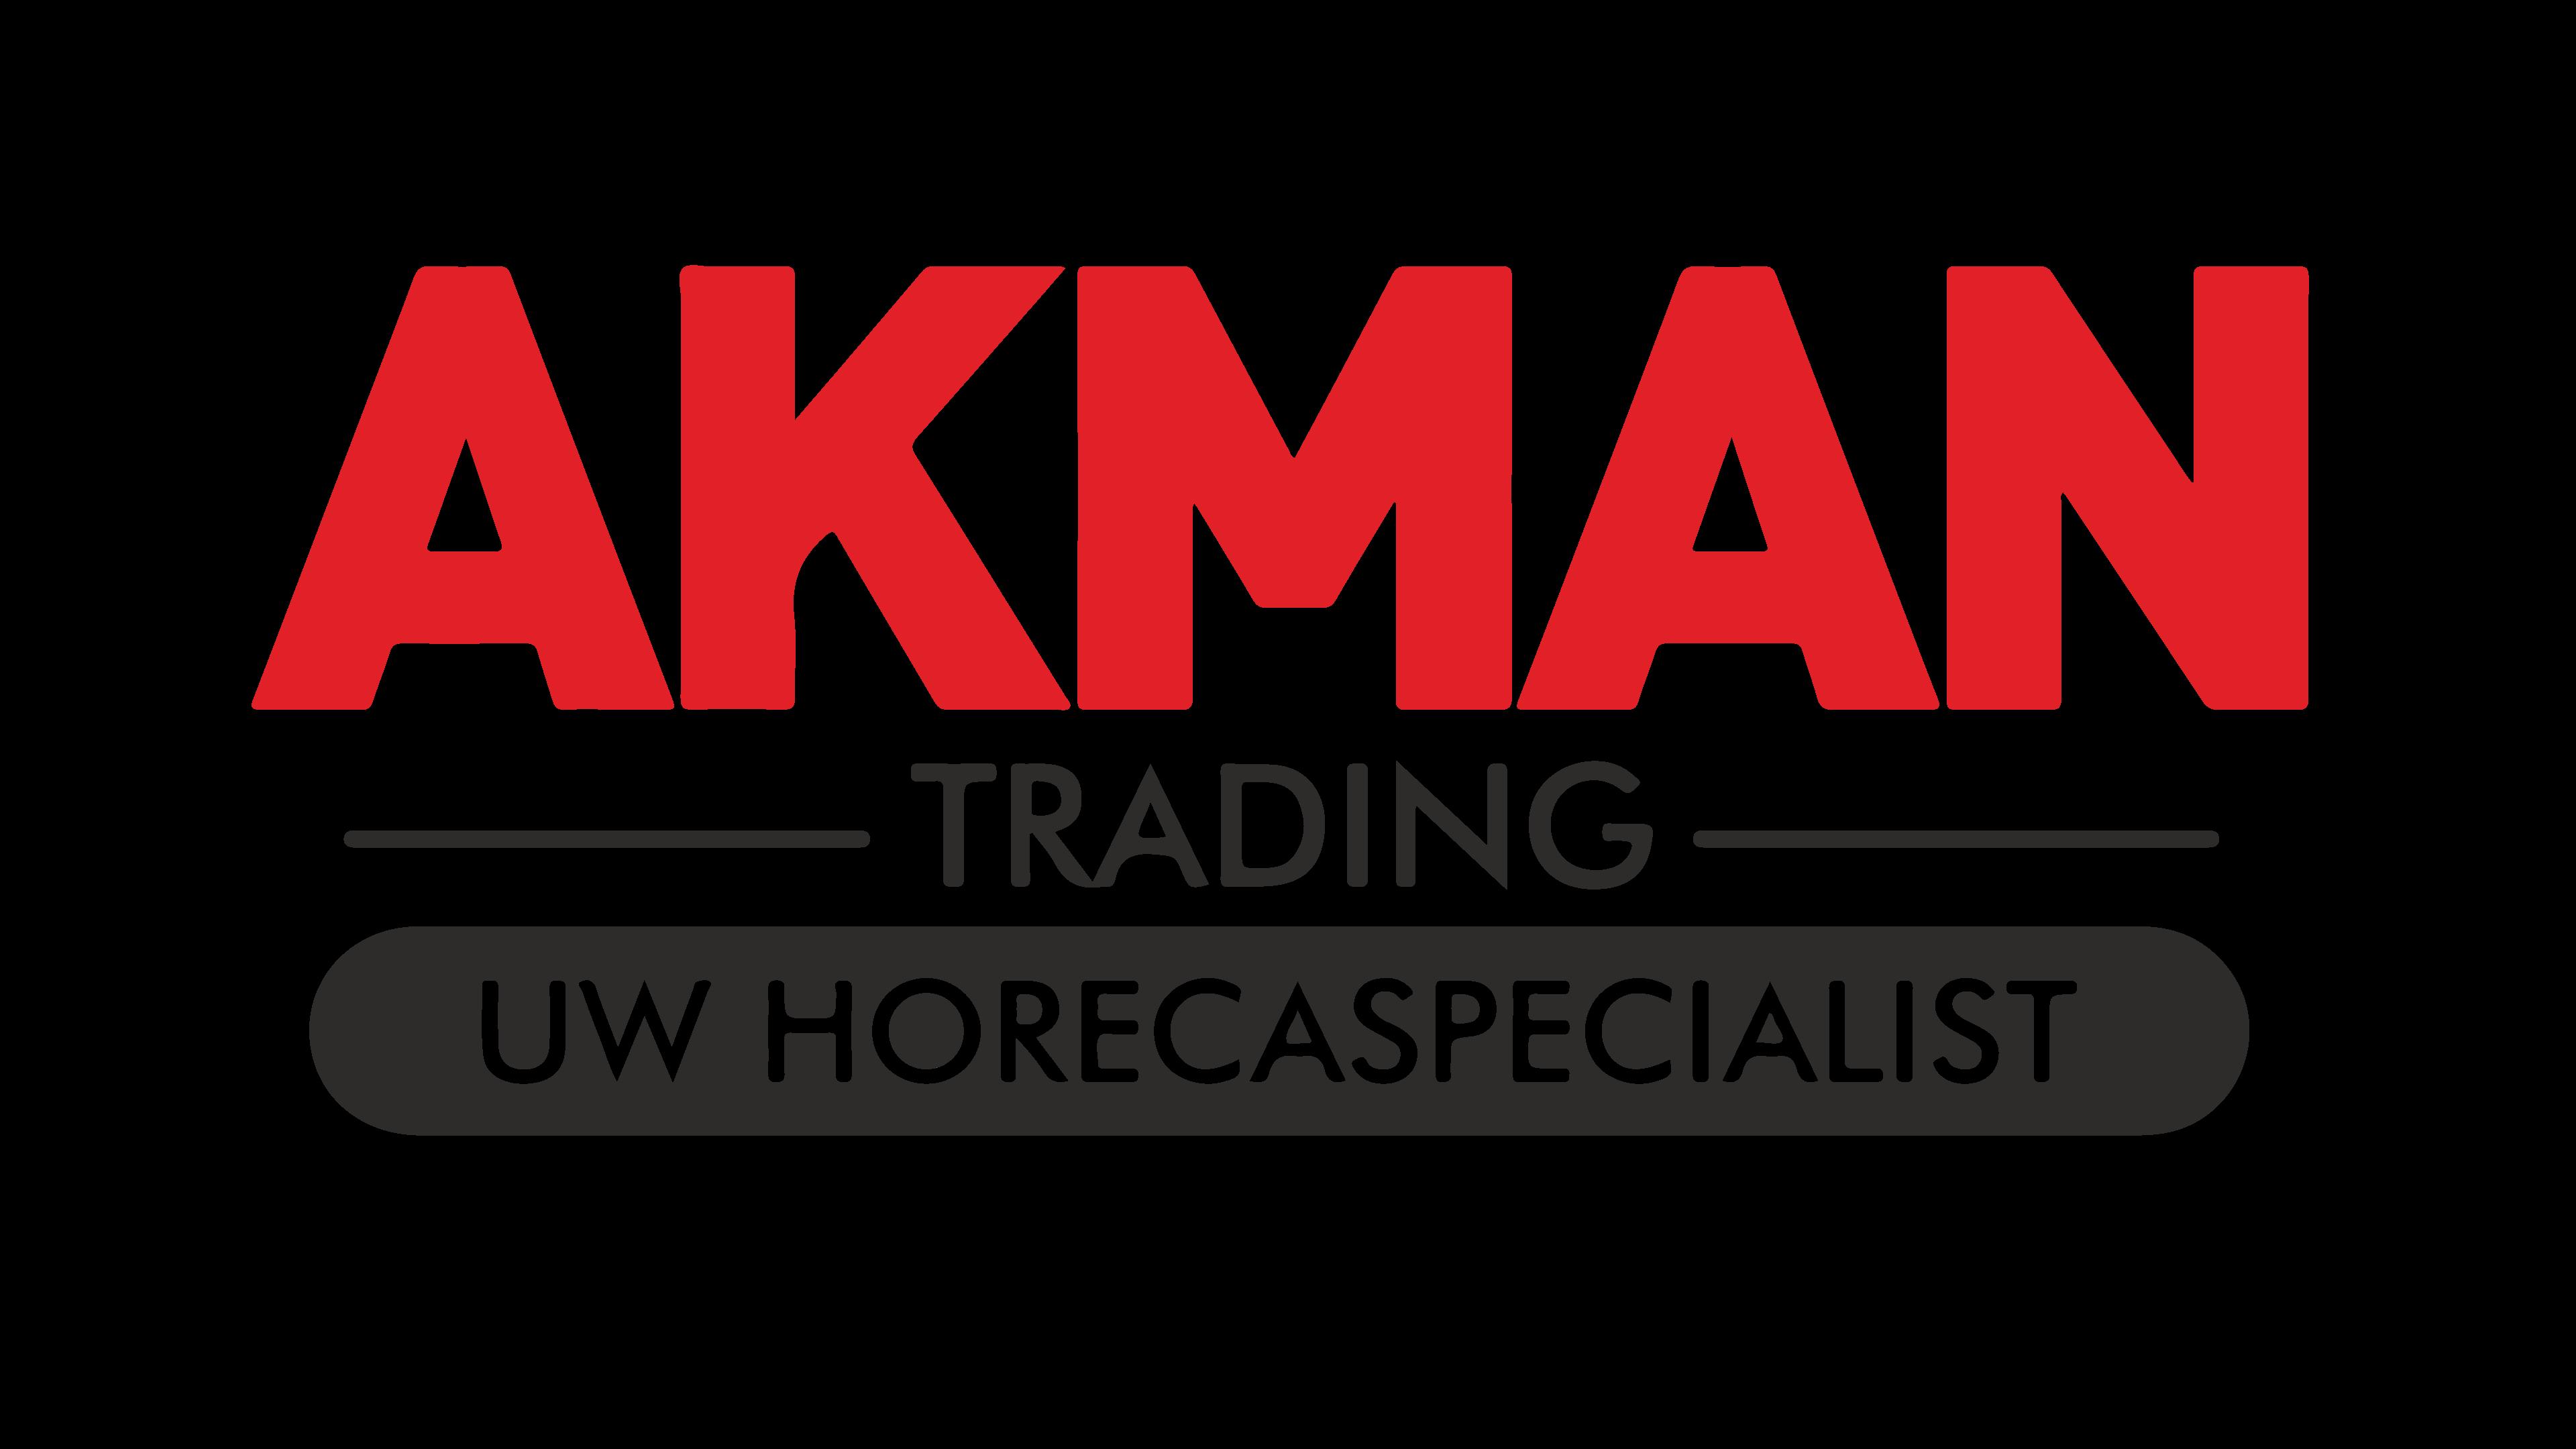 Akmantrading – Gent Logo